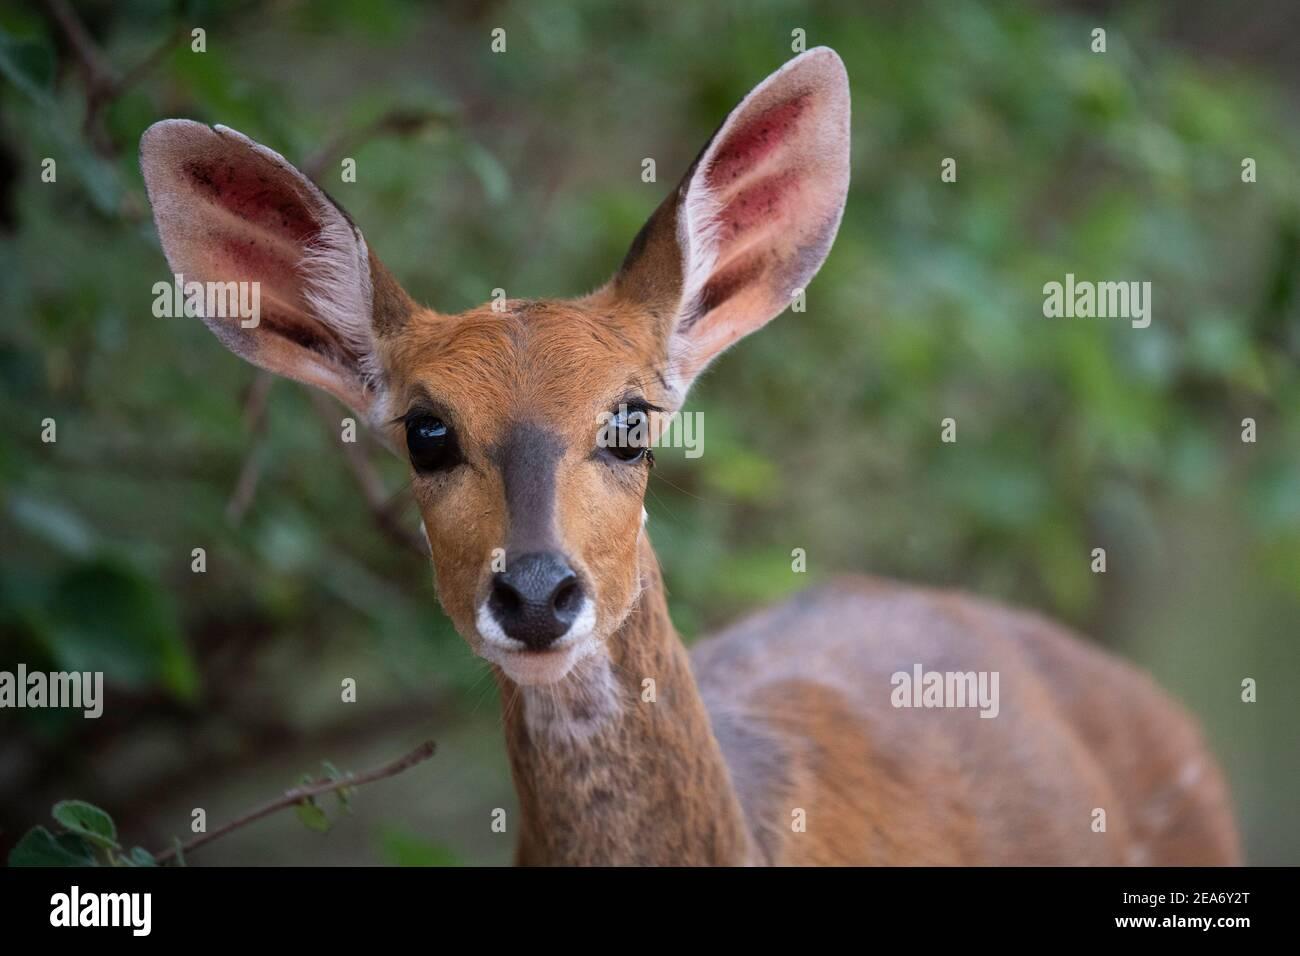 El Bushbuck, Tragelaphus scriptus, el Parque Nacional Kruger, Sudáfrica Foto de stock